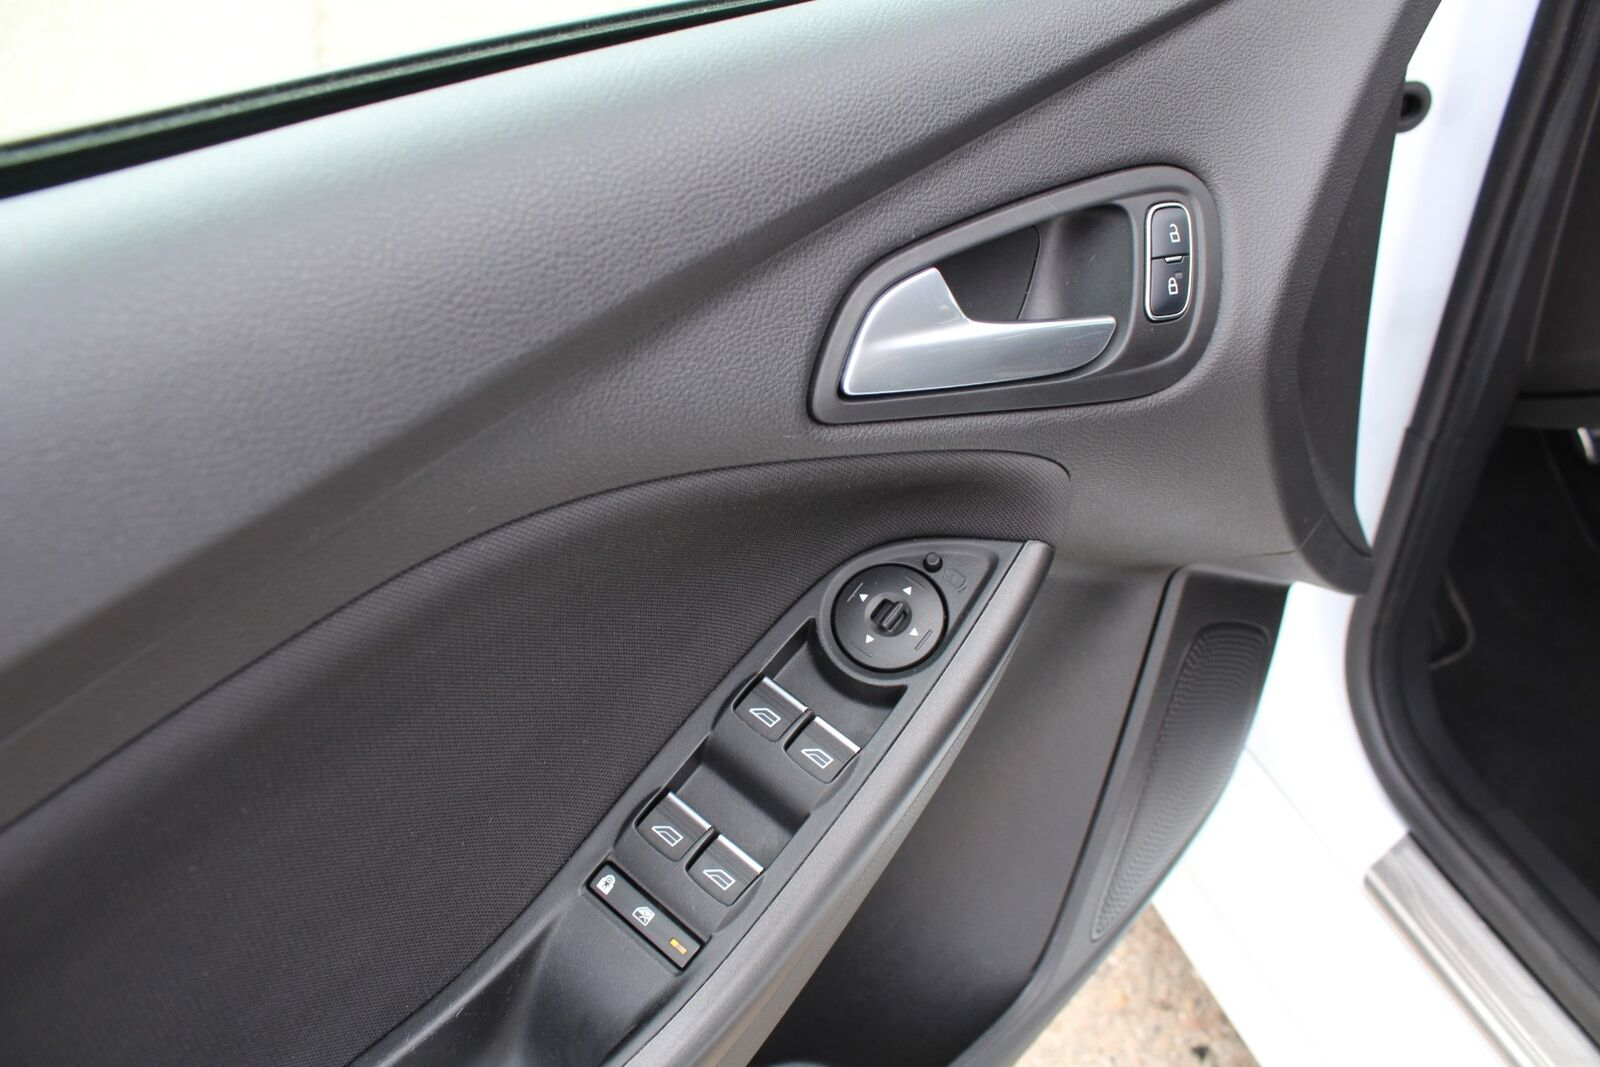 Ford Focus 1,5 TDCi 120 ST-Line stc. aut. - billede 9